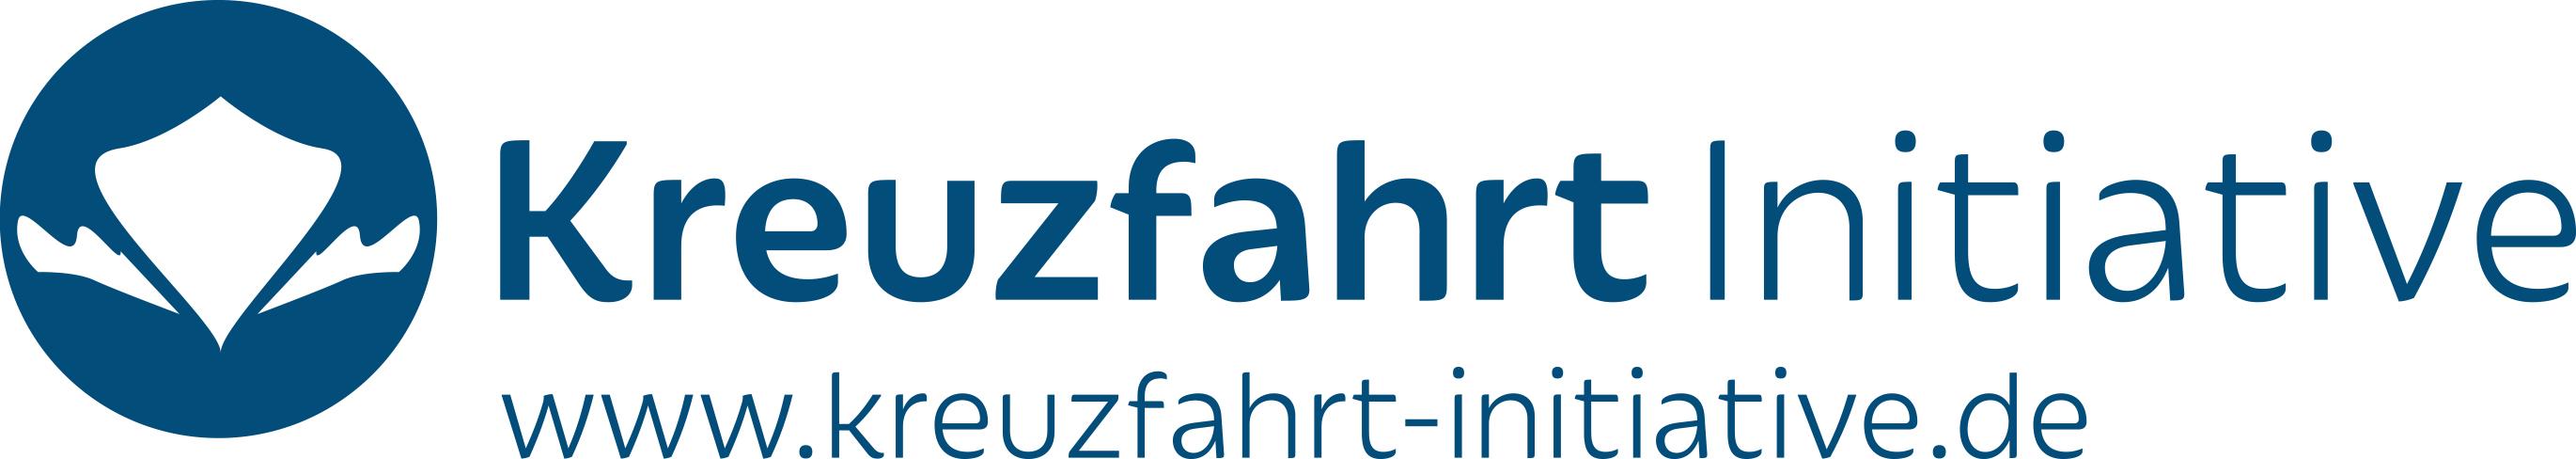 kreuzfahrtinitiative_logo_miturl.jpg